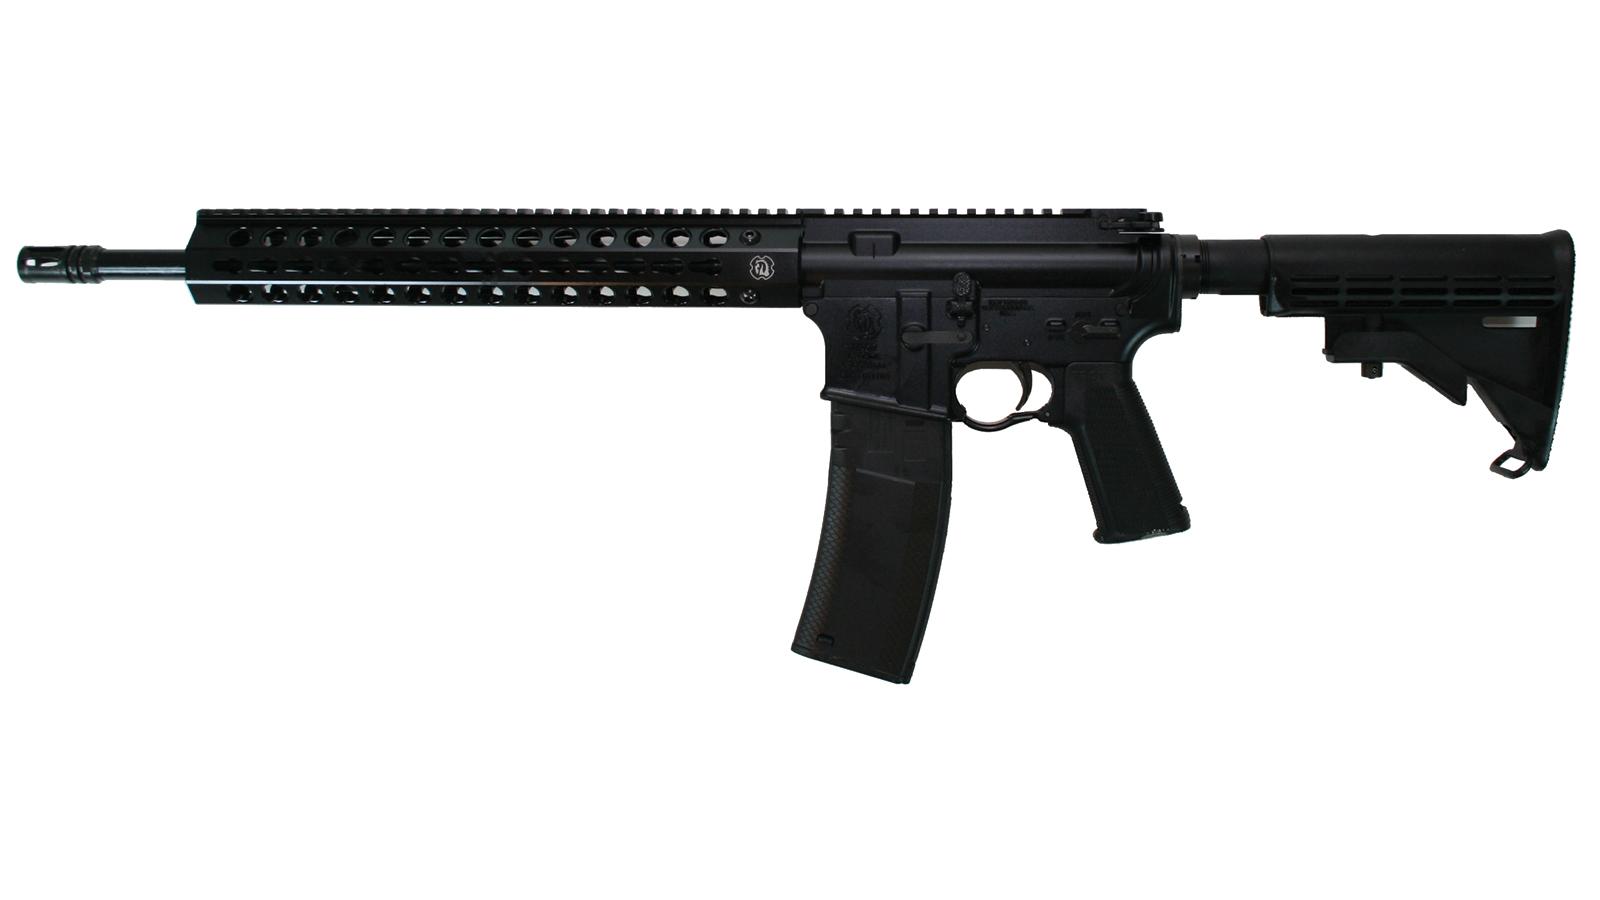 Troy Ind  CBQ SPC A3 Semi-Automatic 223 Remington|5.56 NATO 16 30+1 6-Position Black Stk Black Hard Coat Anodized in.